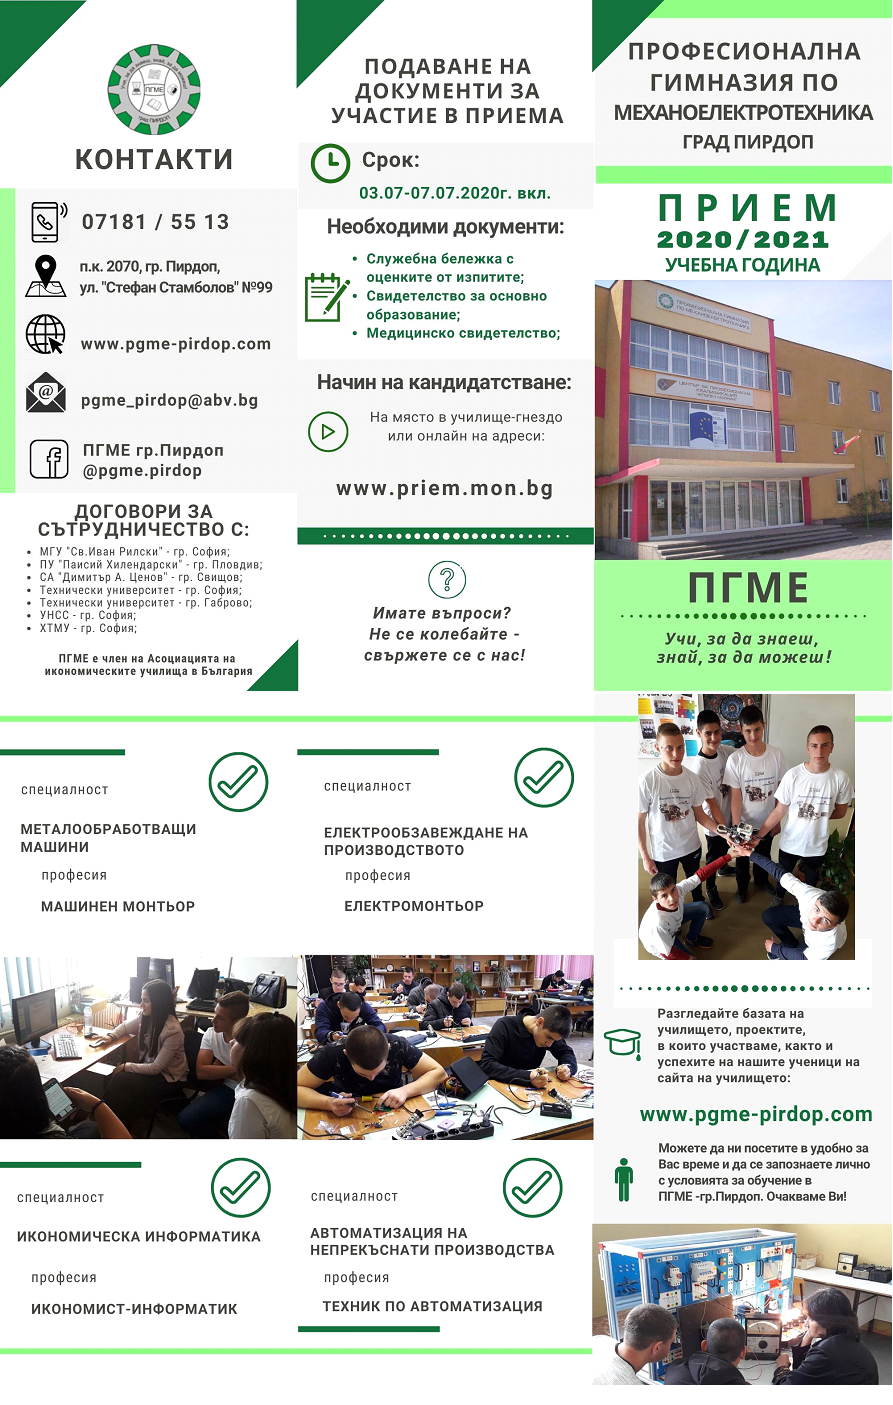 Прием 2020/2021 – информационна брошура